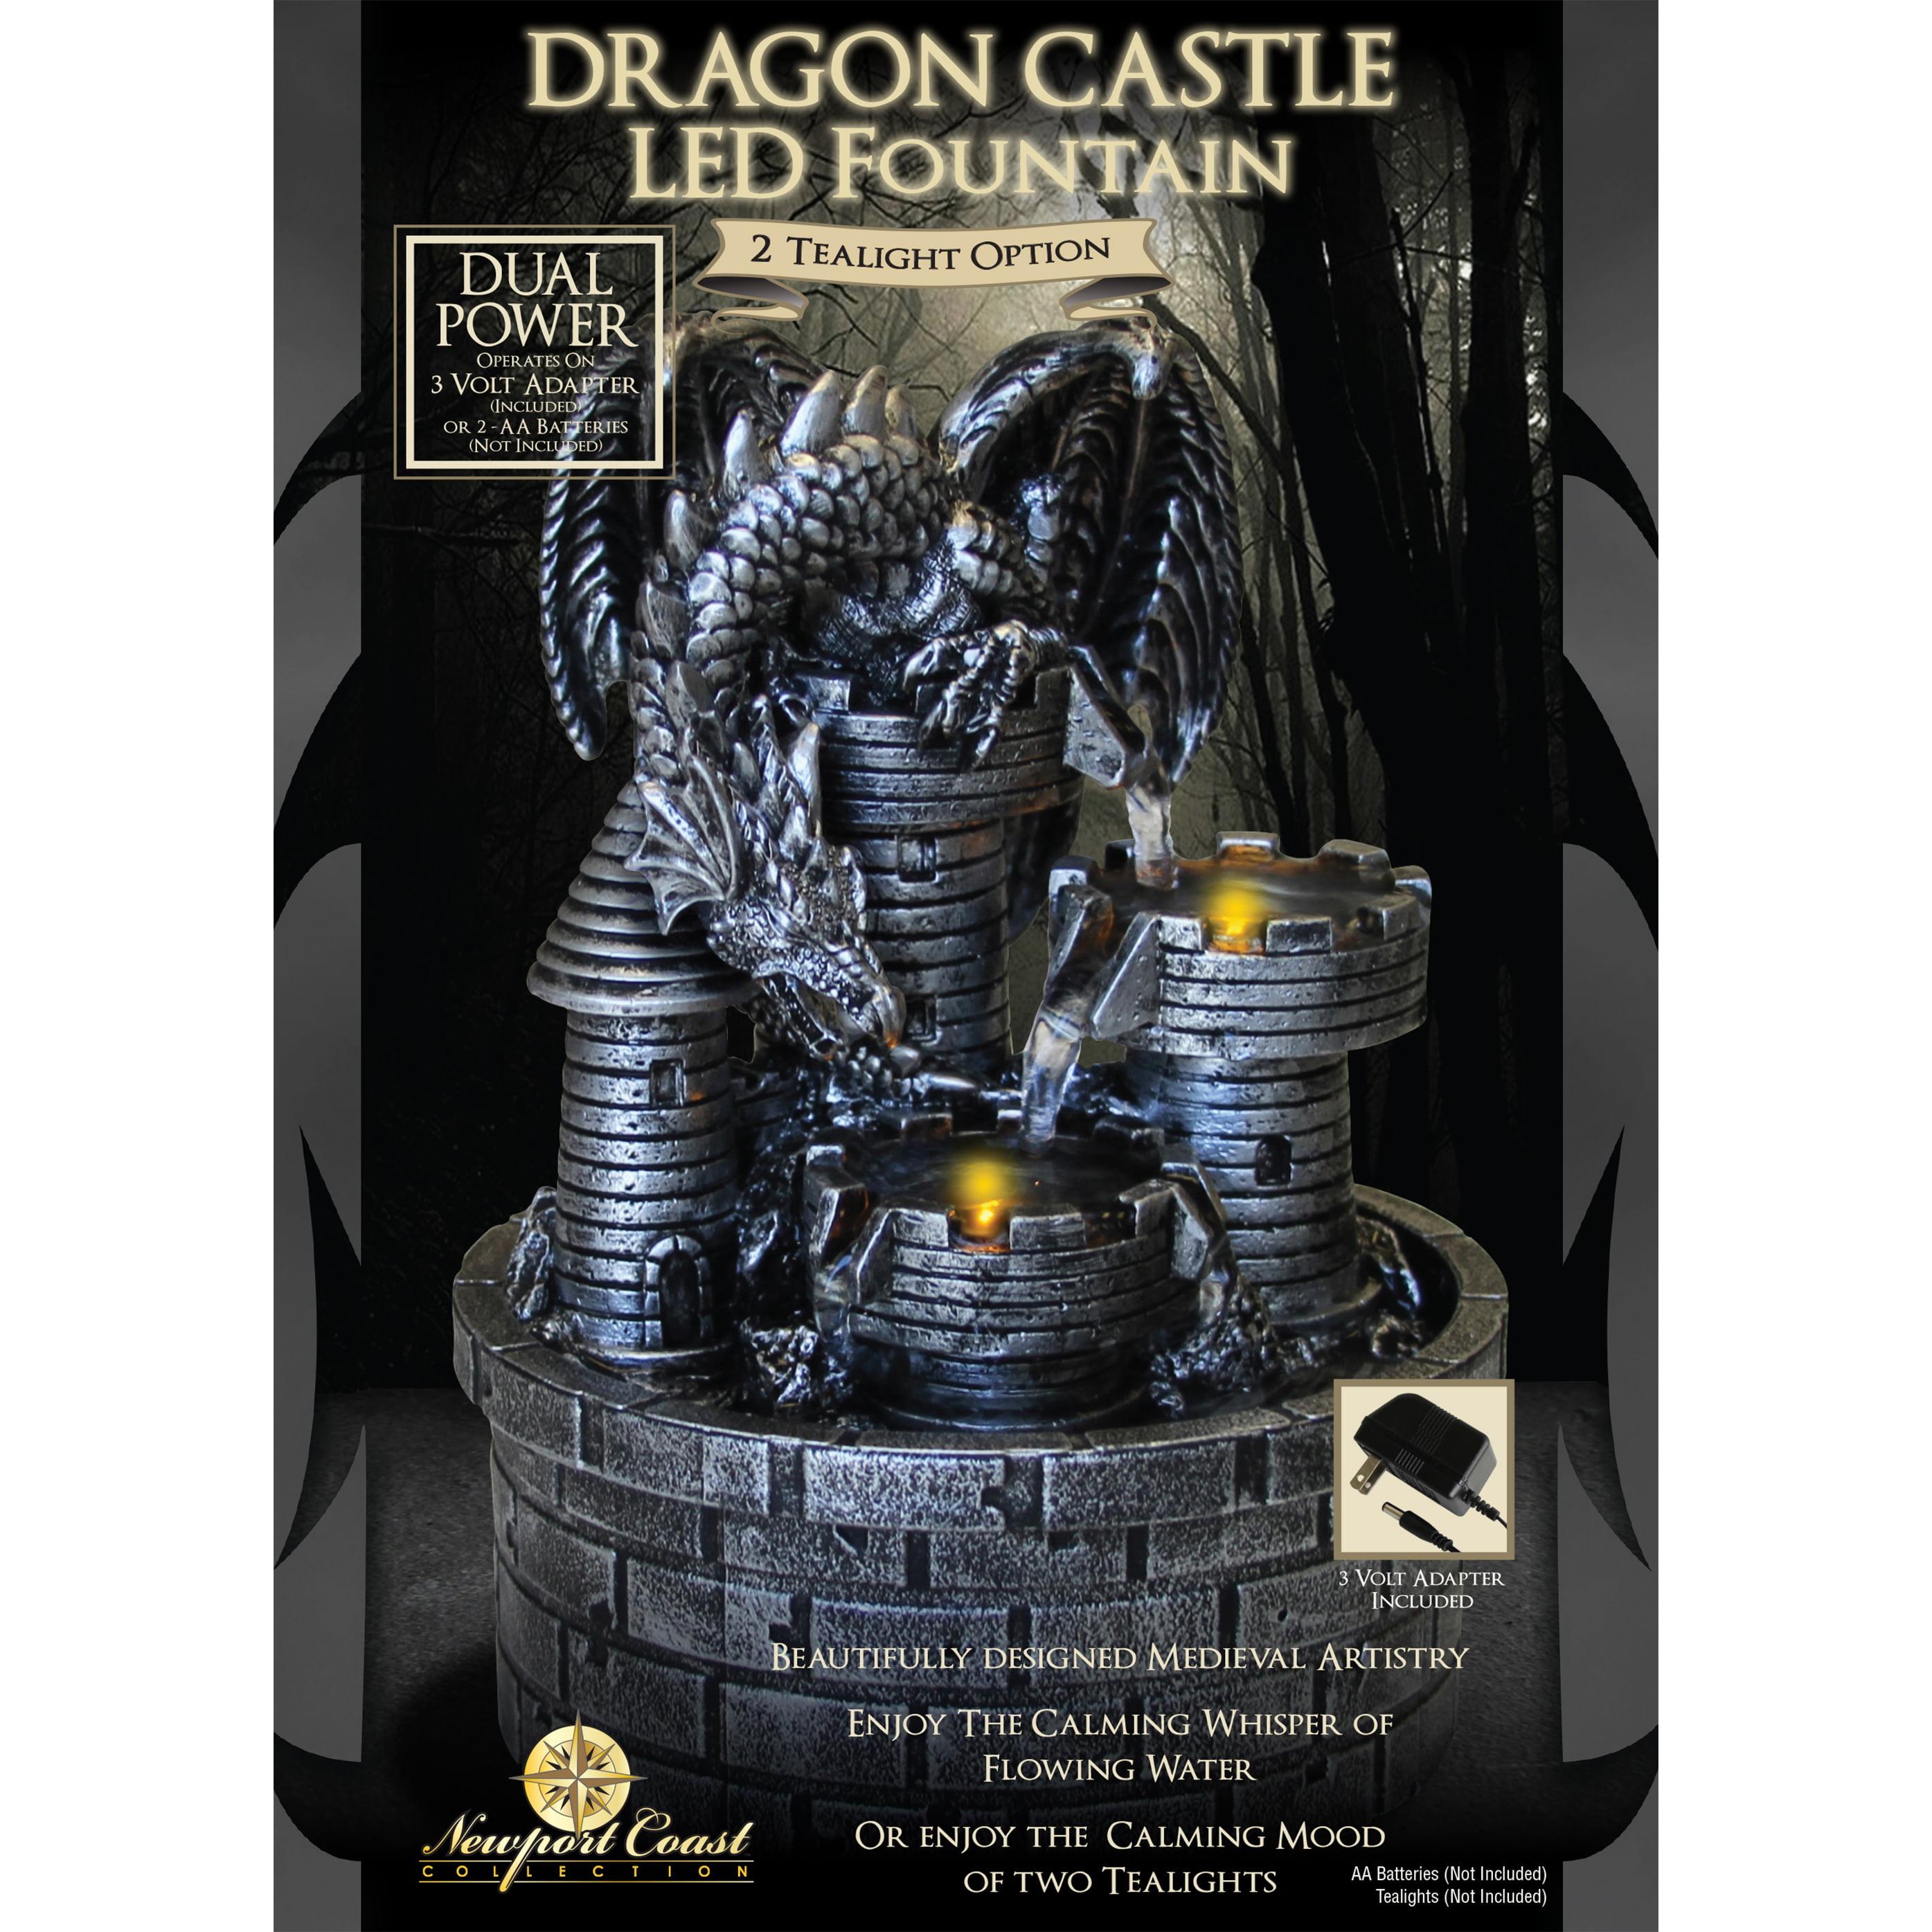 Newport Coast Collection Dragon Castle LED Fountain